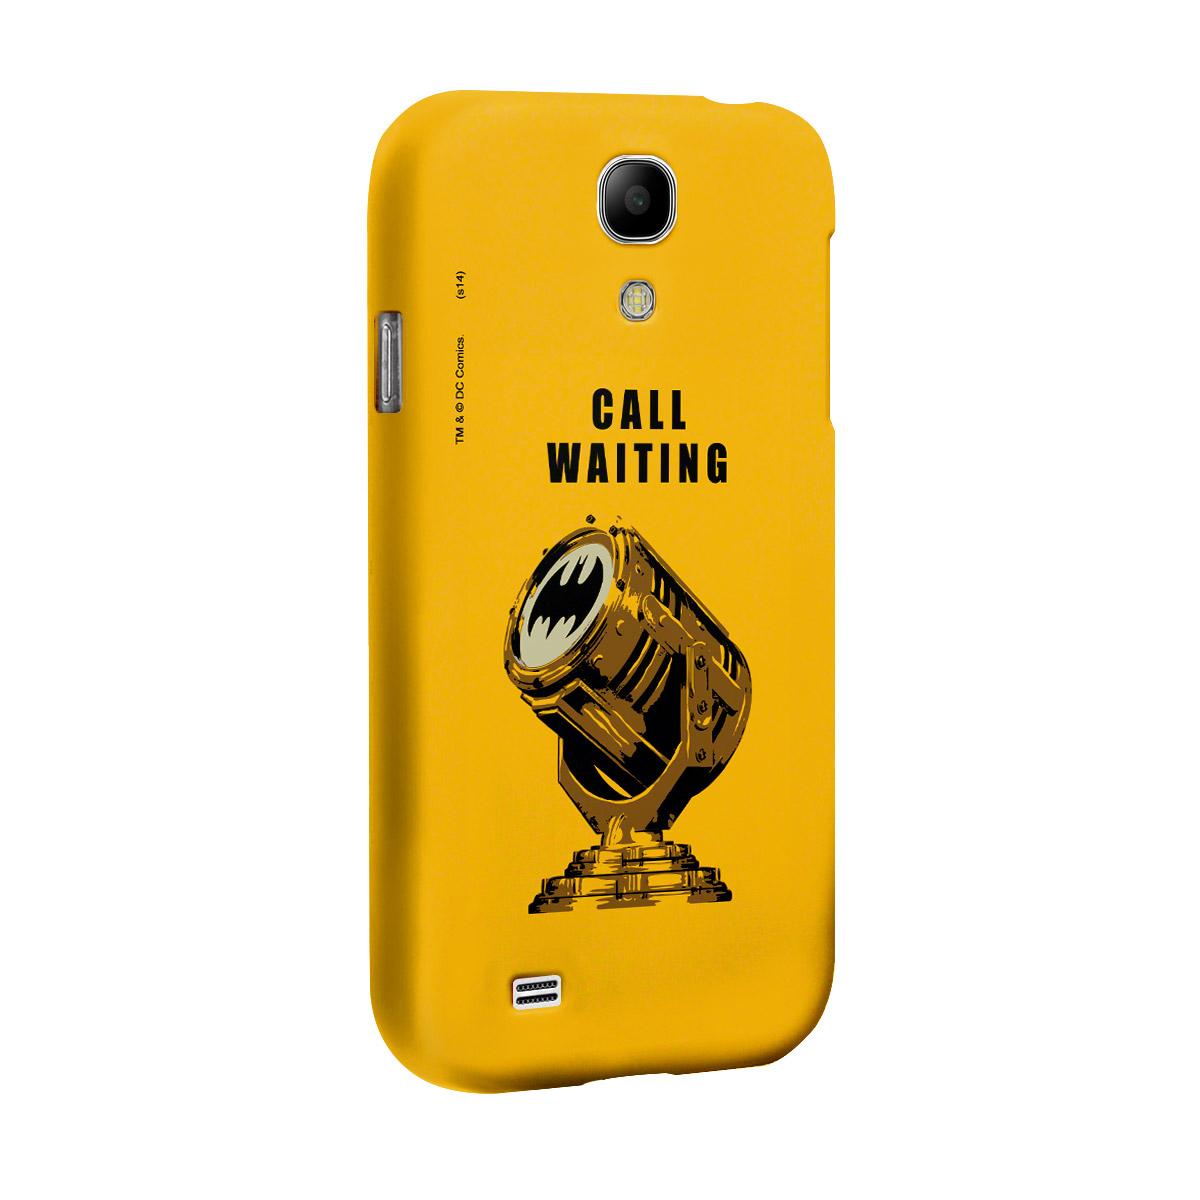 Capa de Celular Samsung Galaxy S4 Batman Chamada em Espera